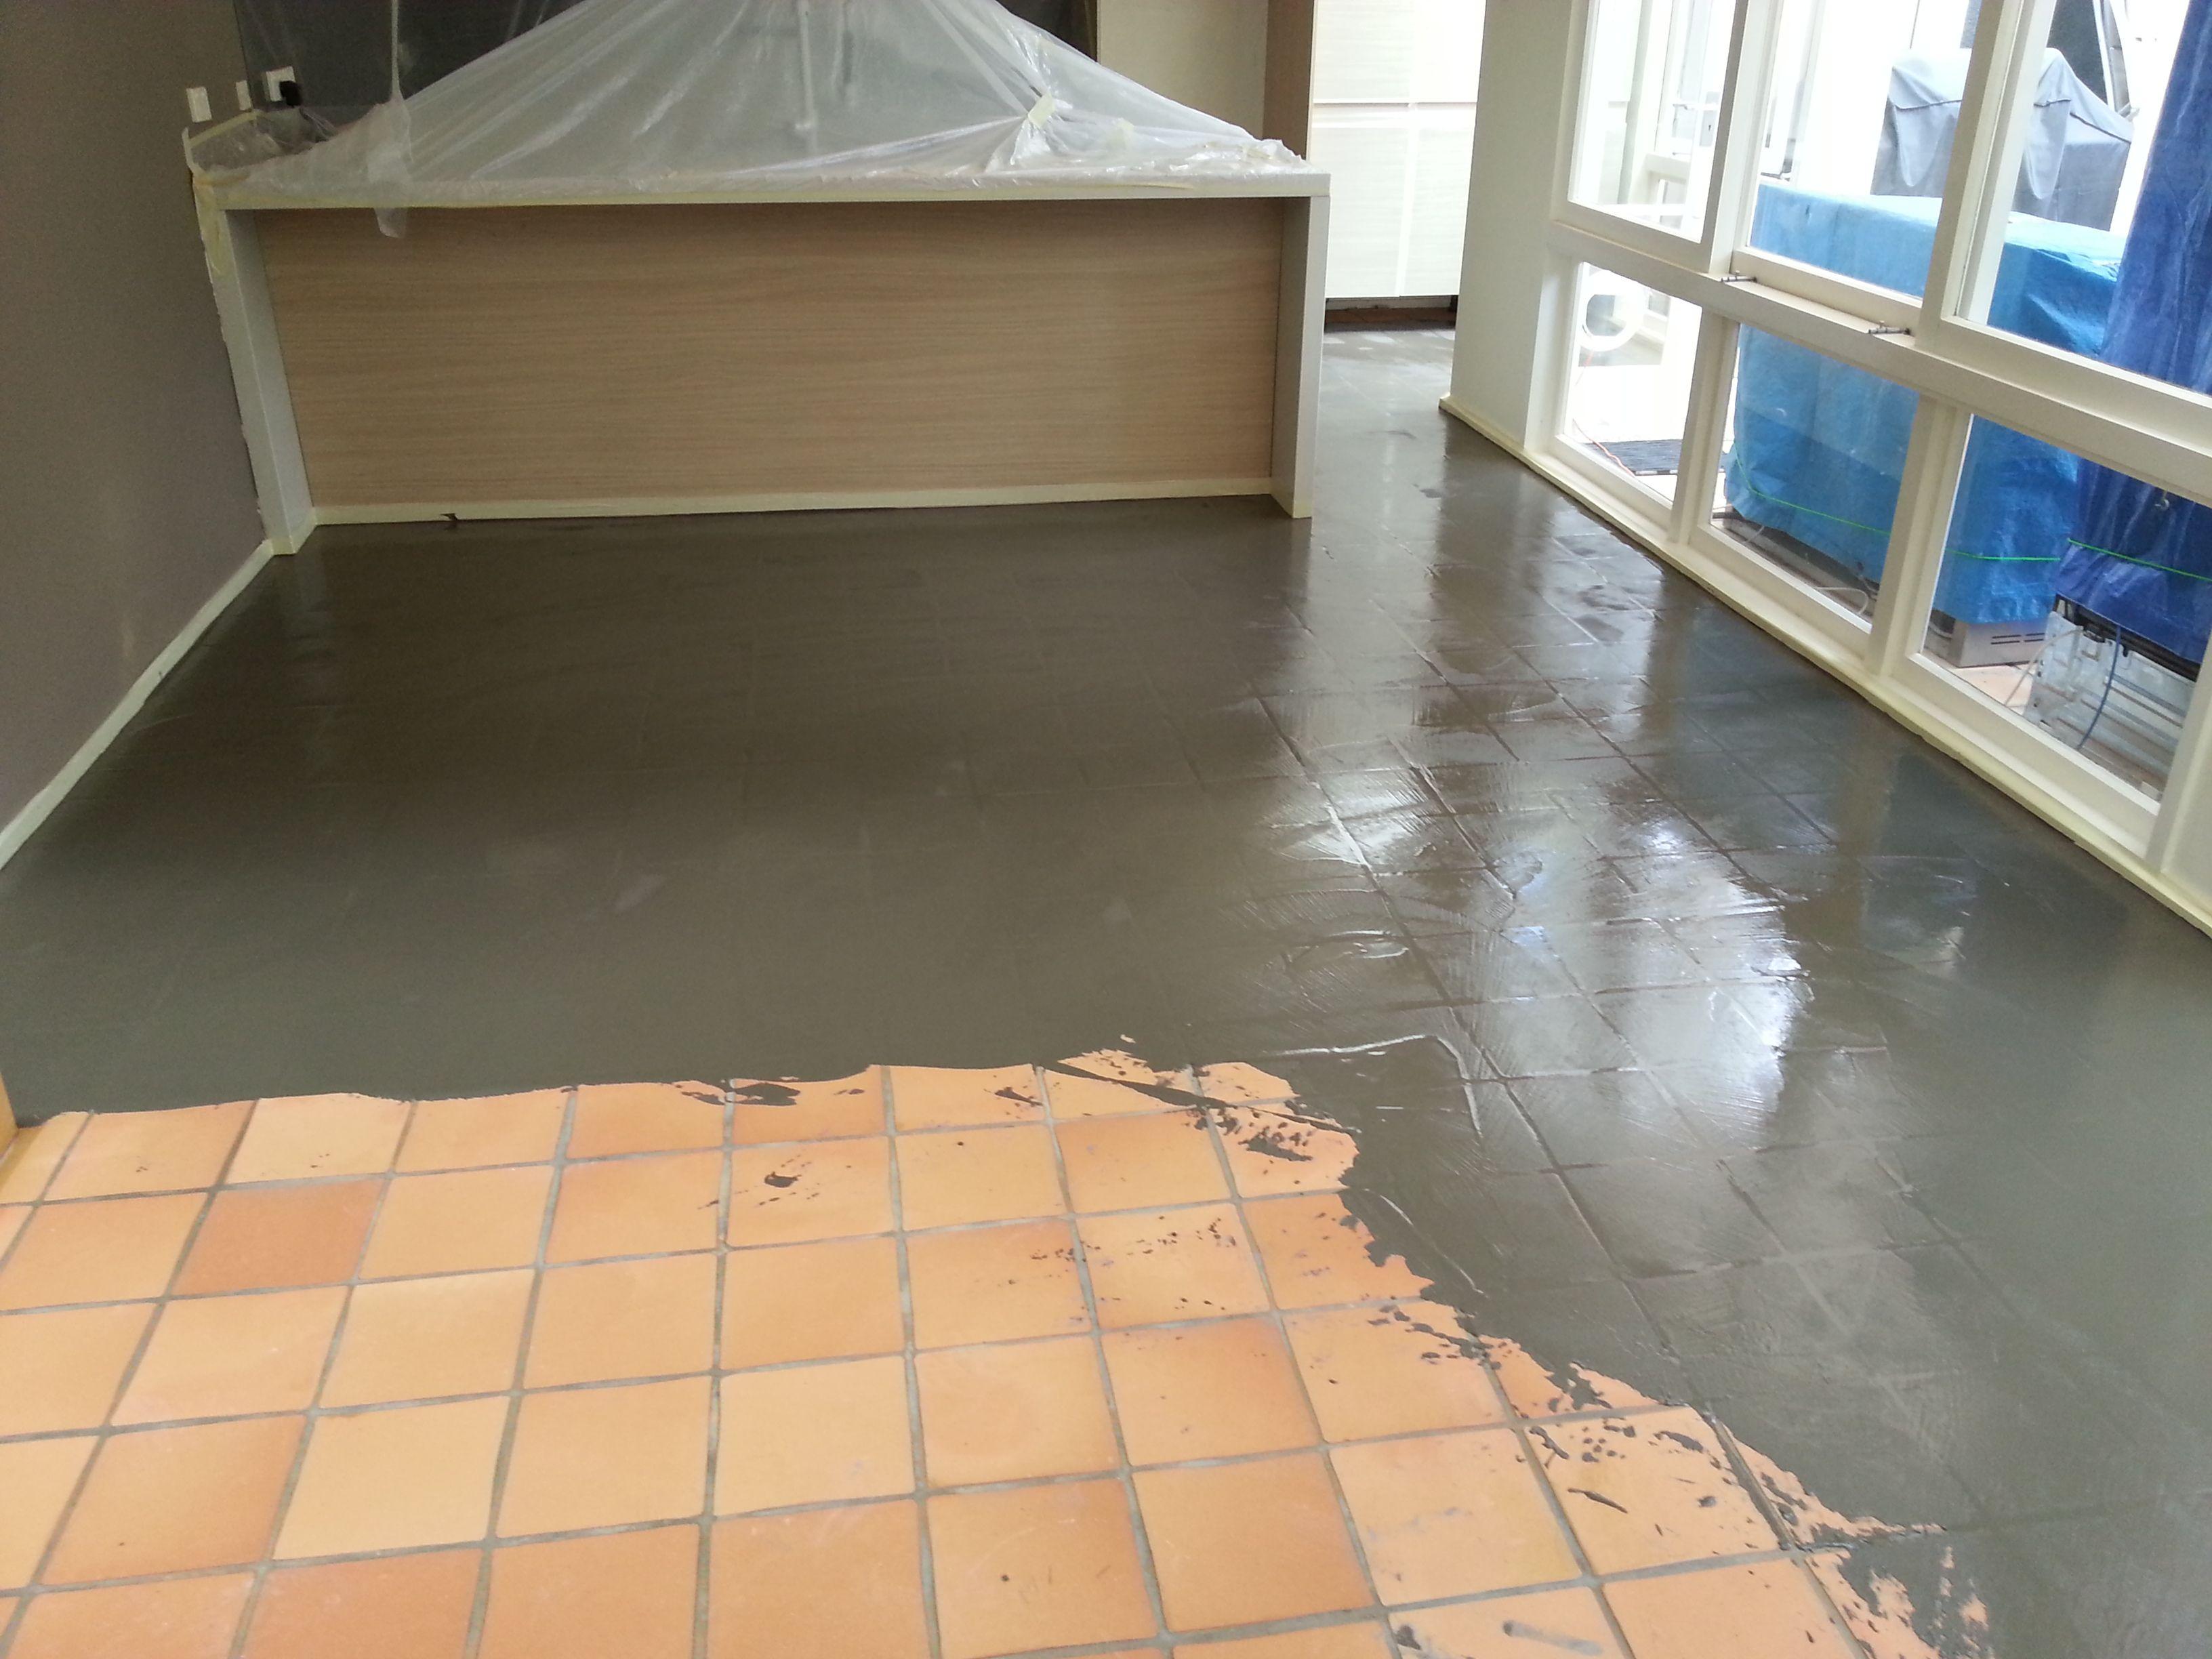 Levelcova Resurfacing Ceramic Floor Tile Flooring